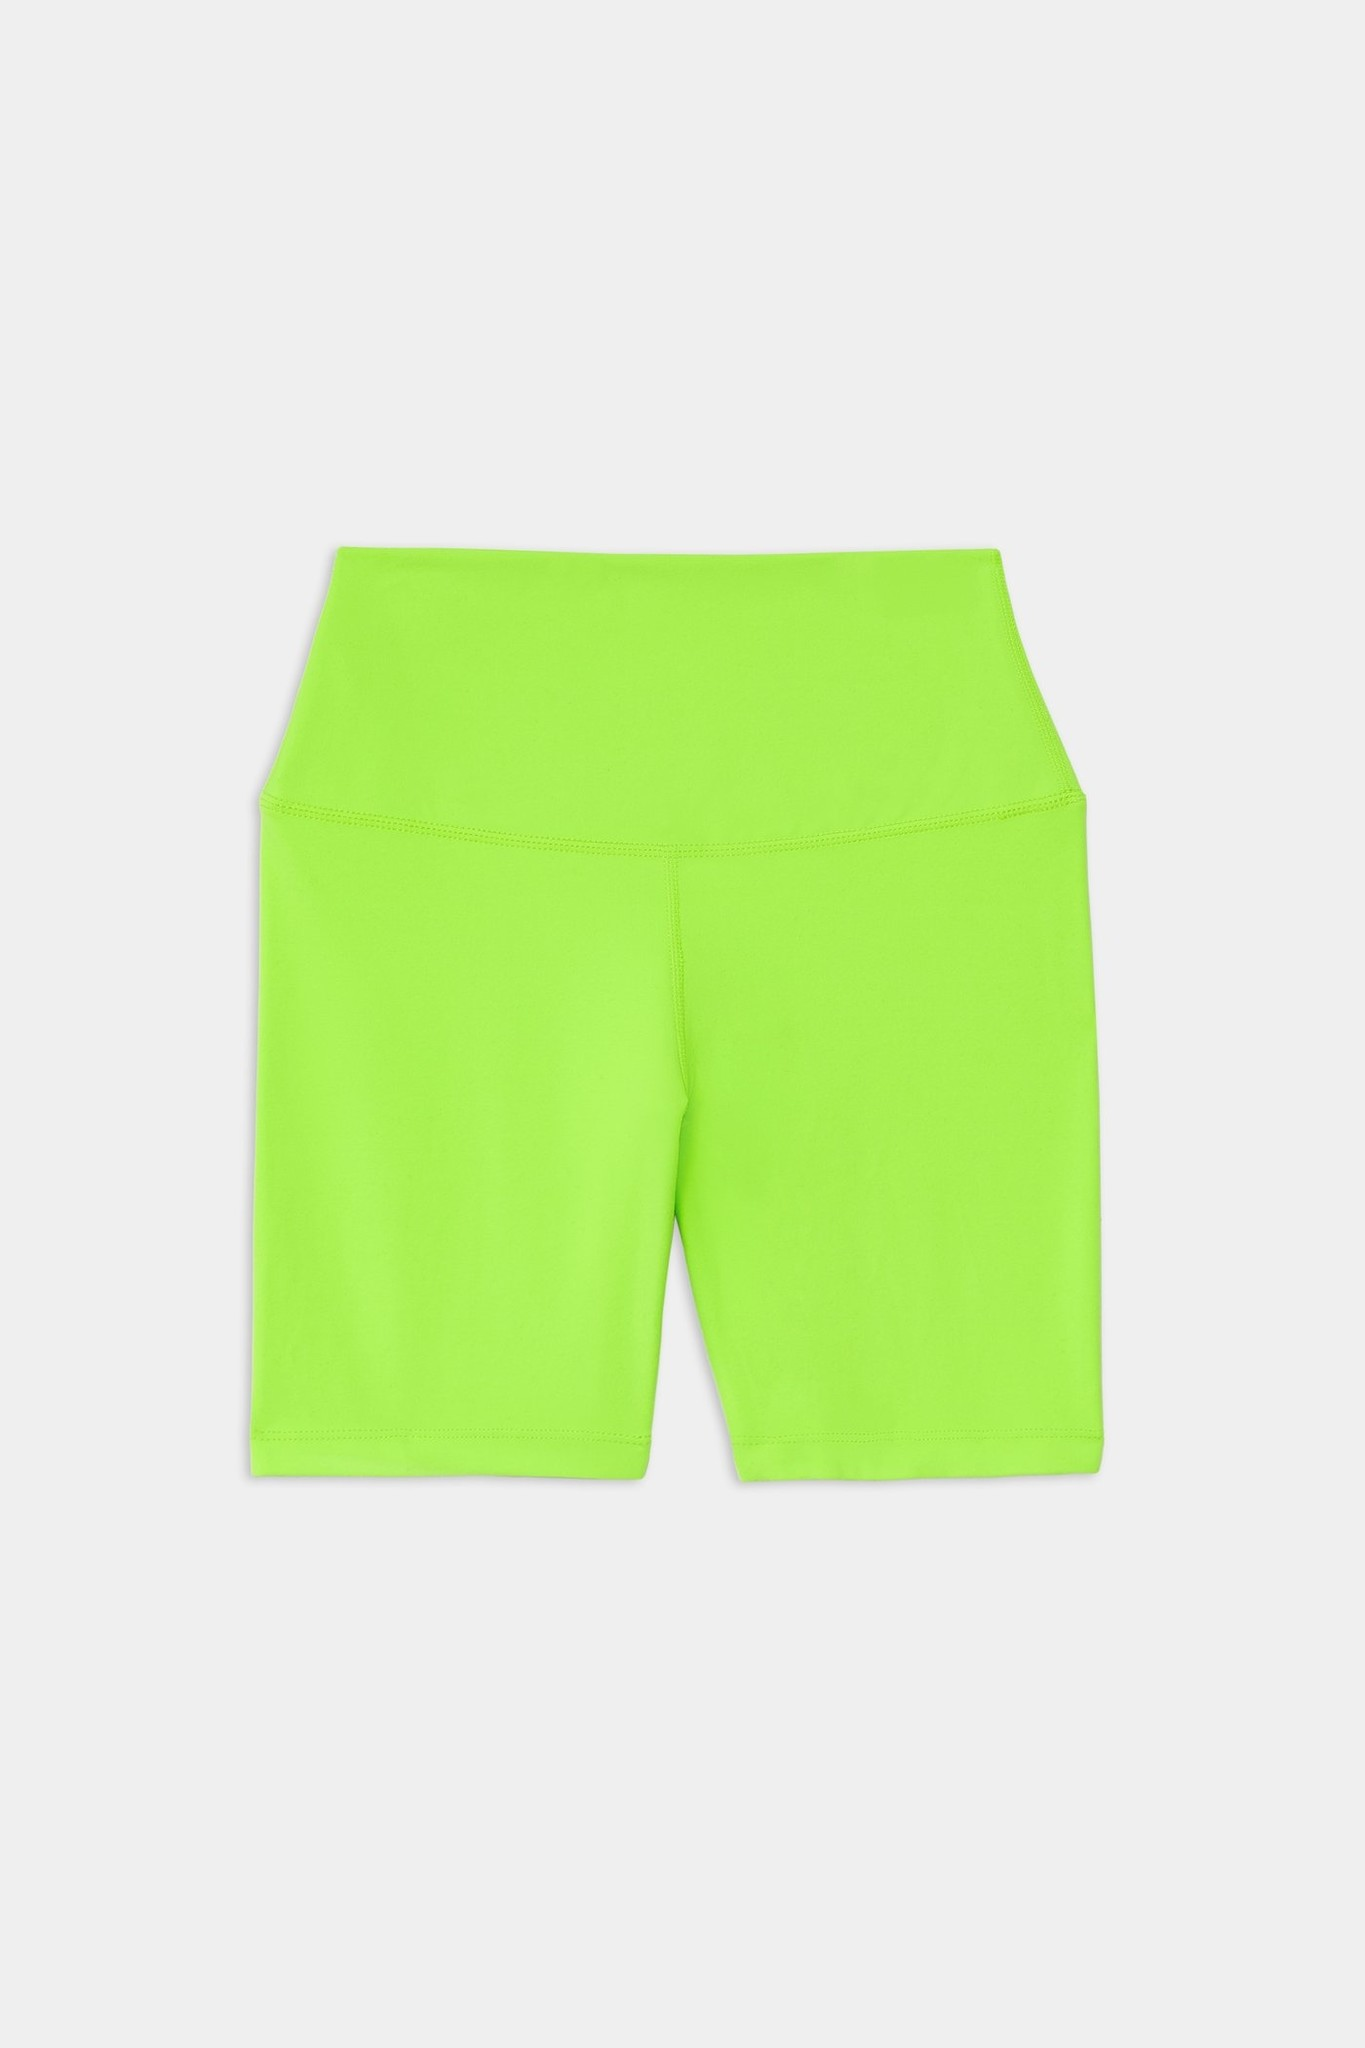 Splits59 Airweight HW Short Neon Lime